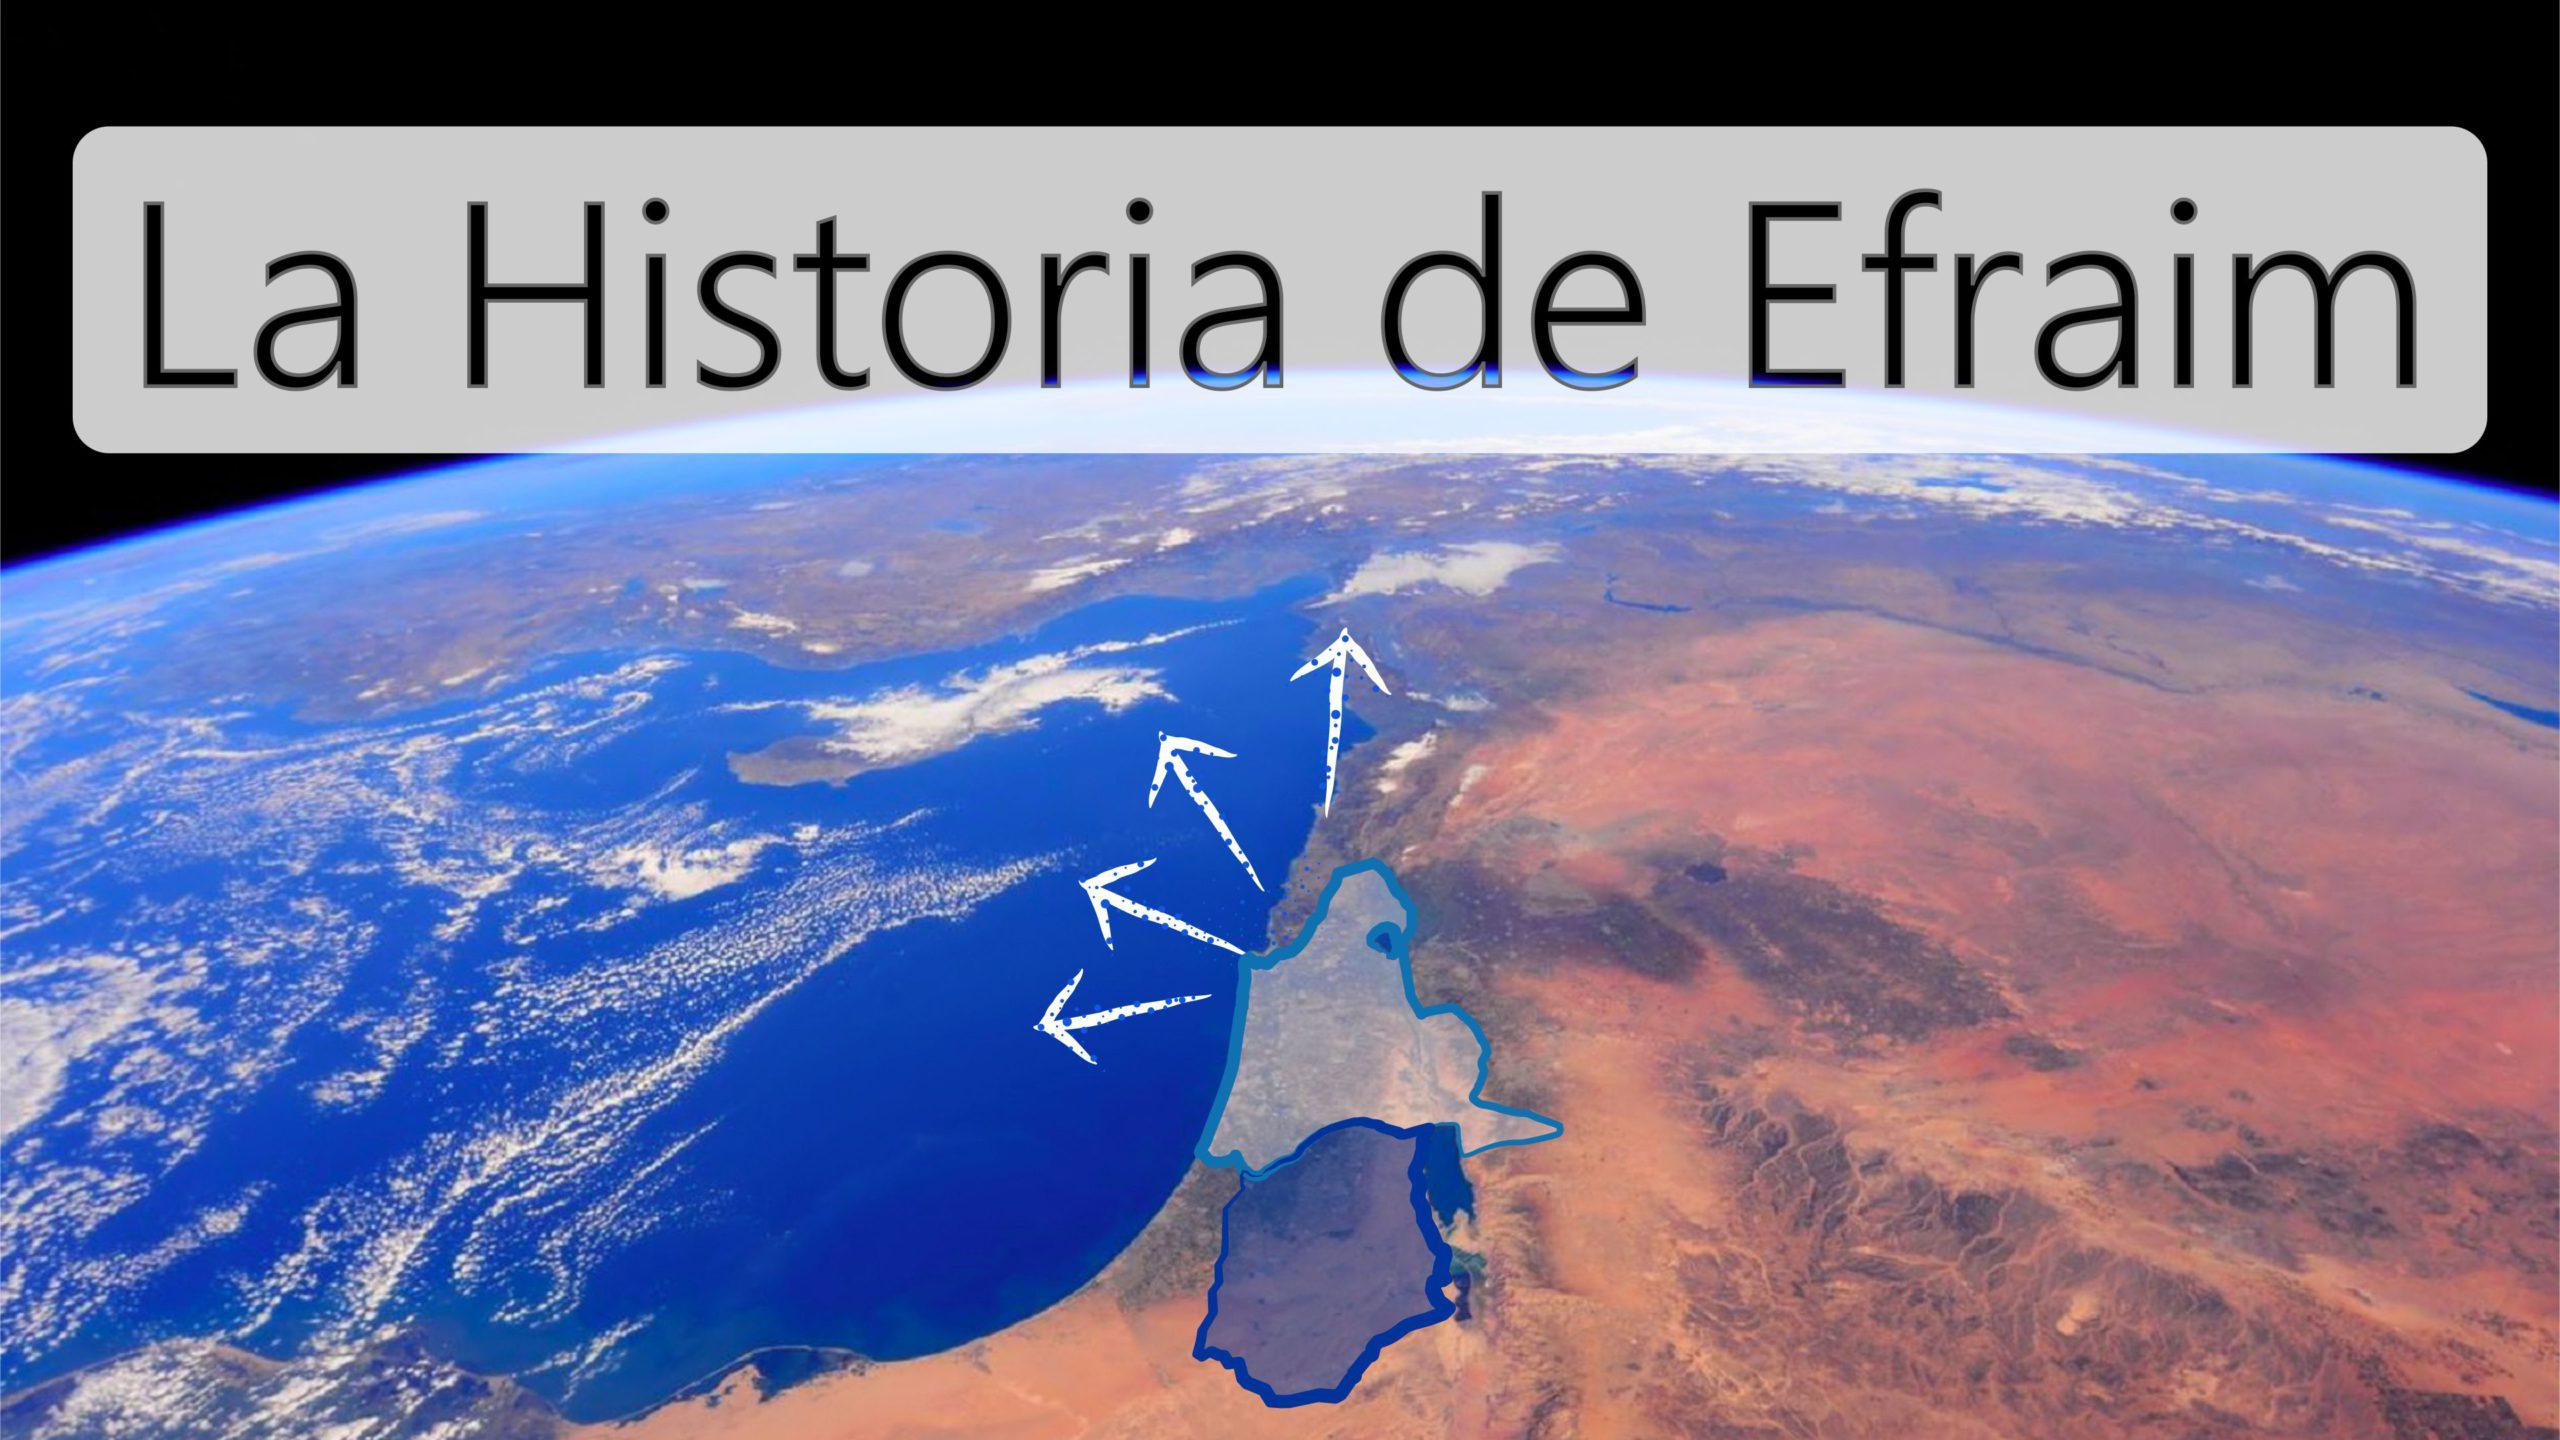 La Historia de Efraim